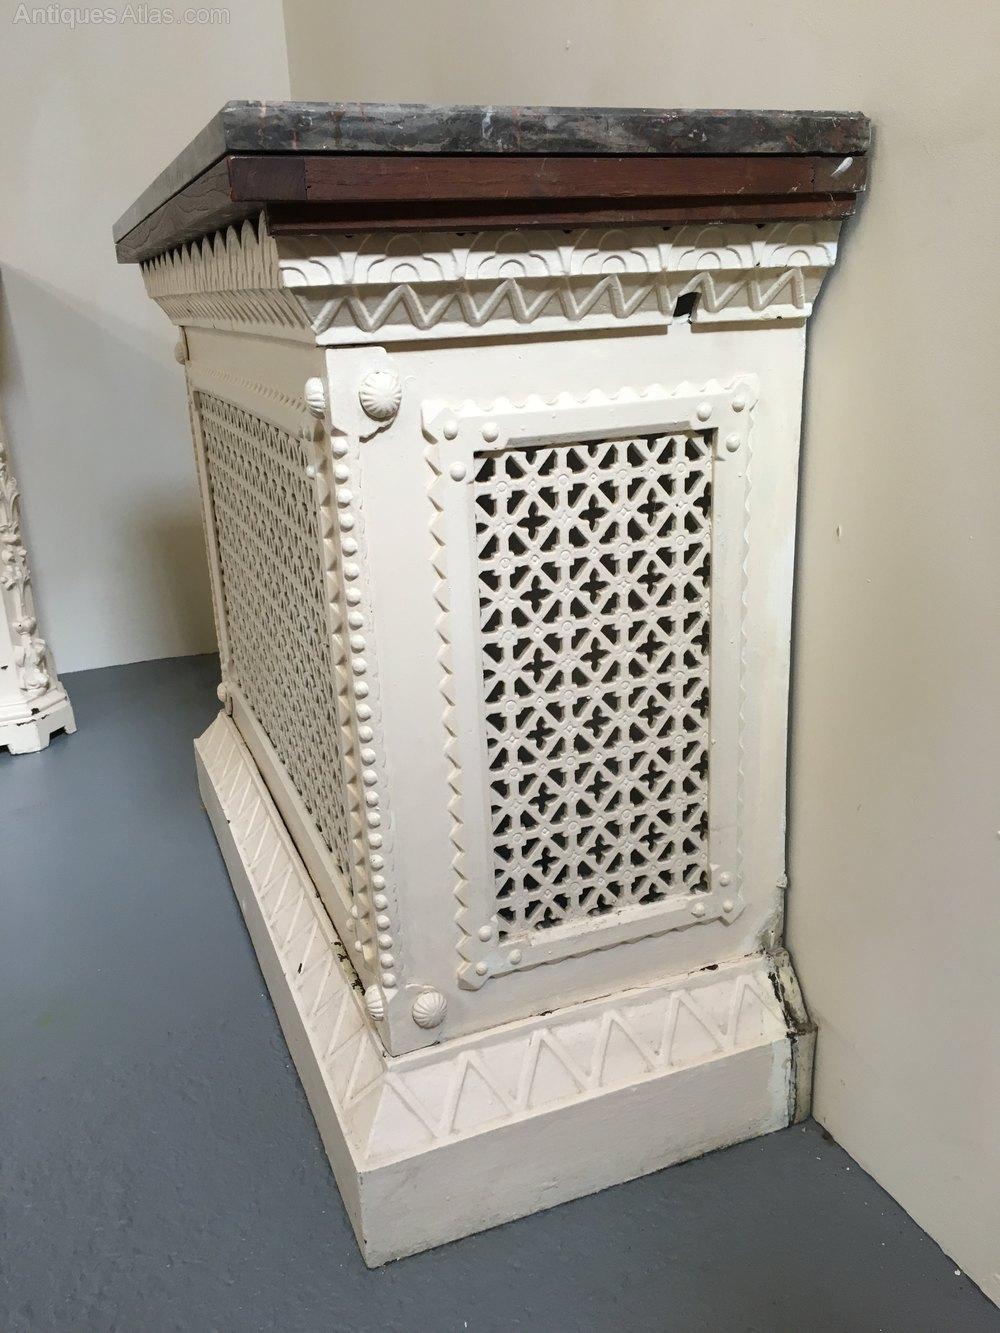 Antiques atlas small cast iron radiator cover - Cast iron radiator covers ...